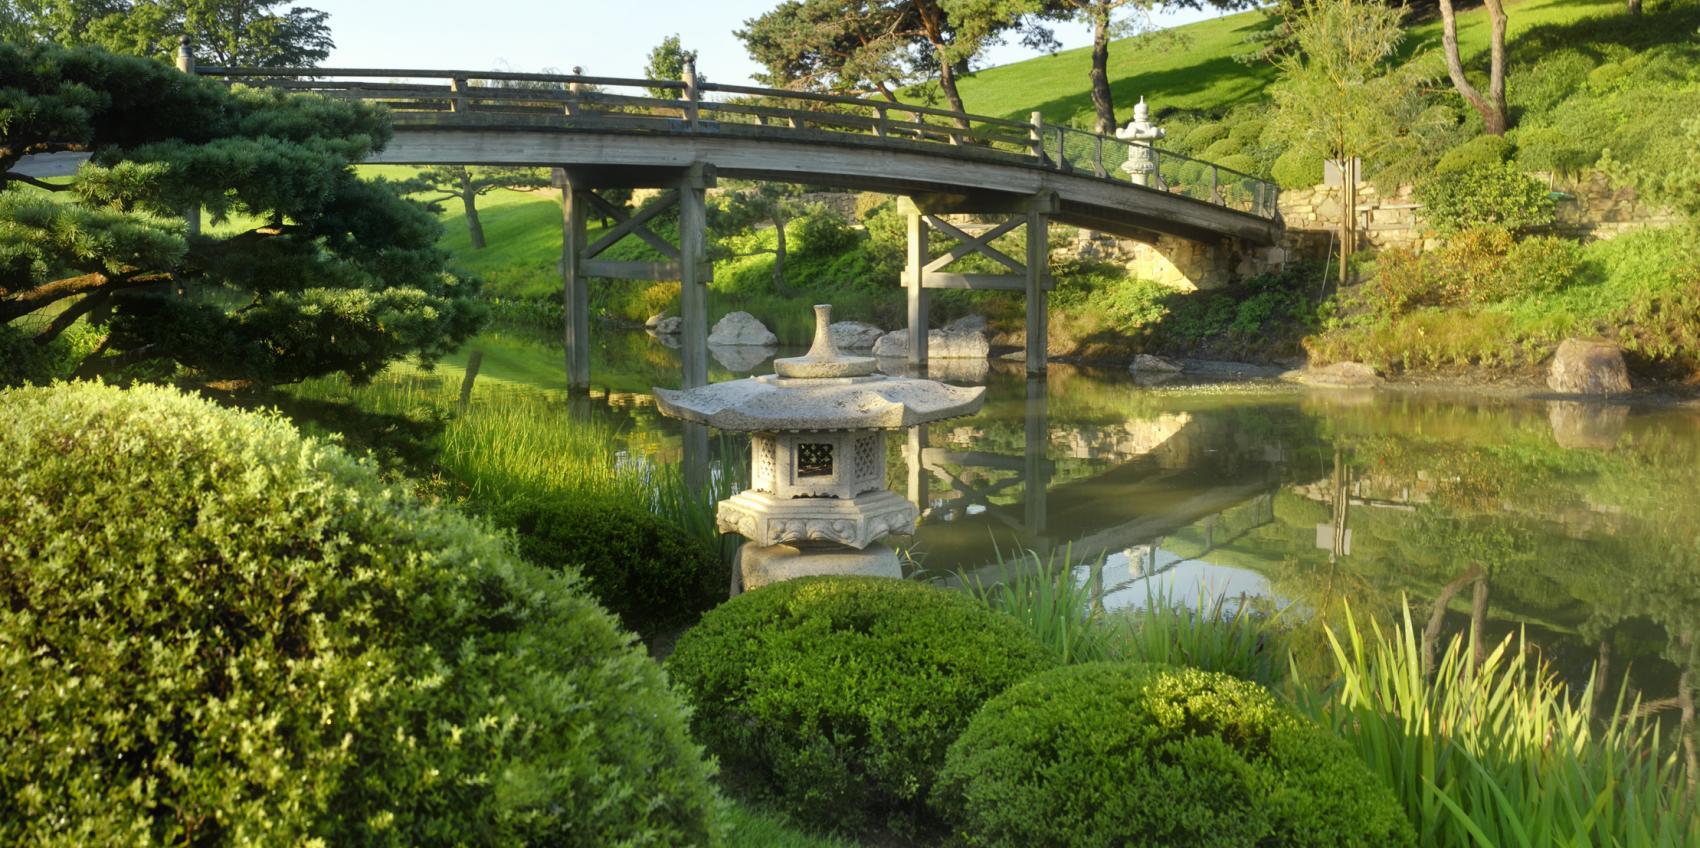 chicago botanic garden | american public gardens association